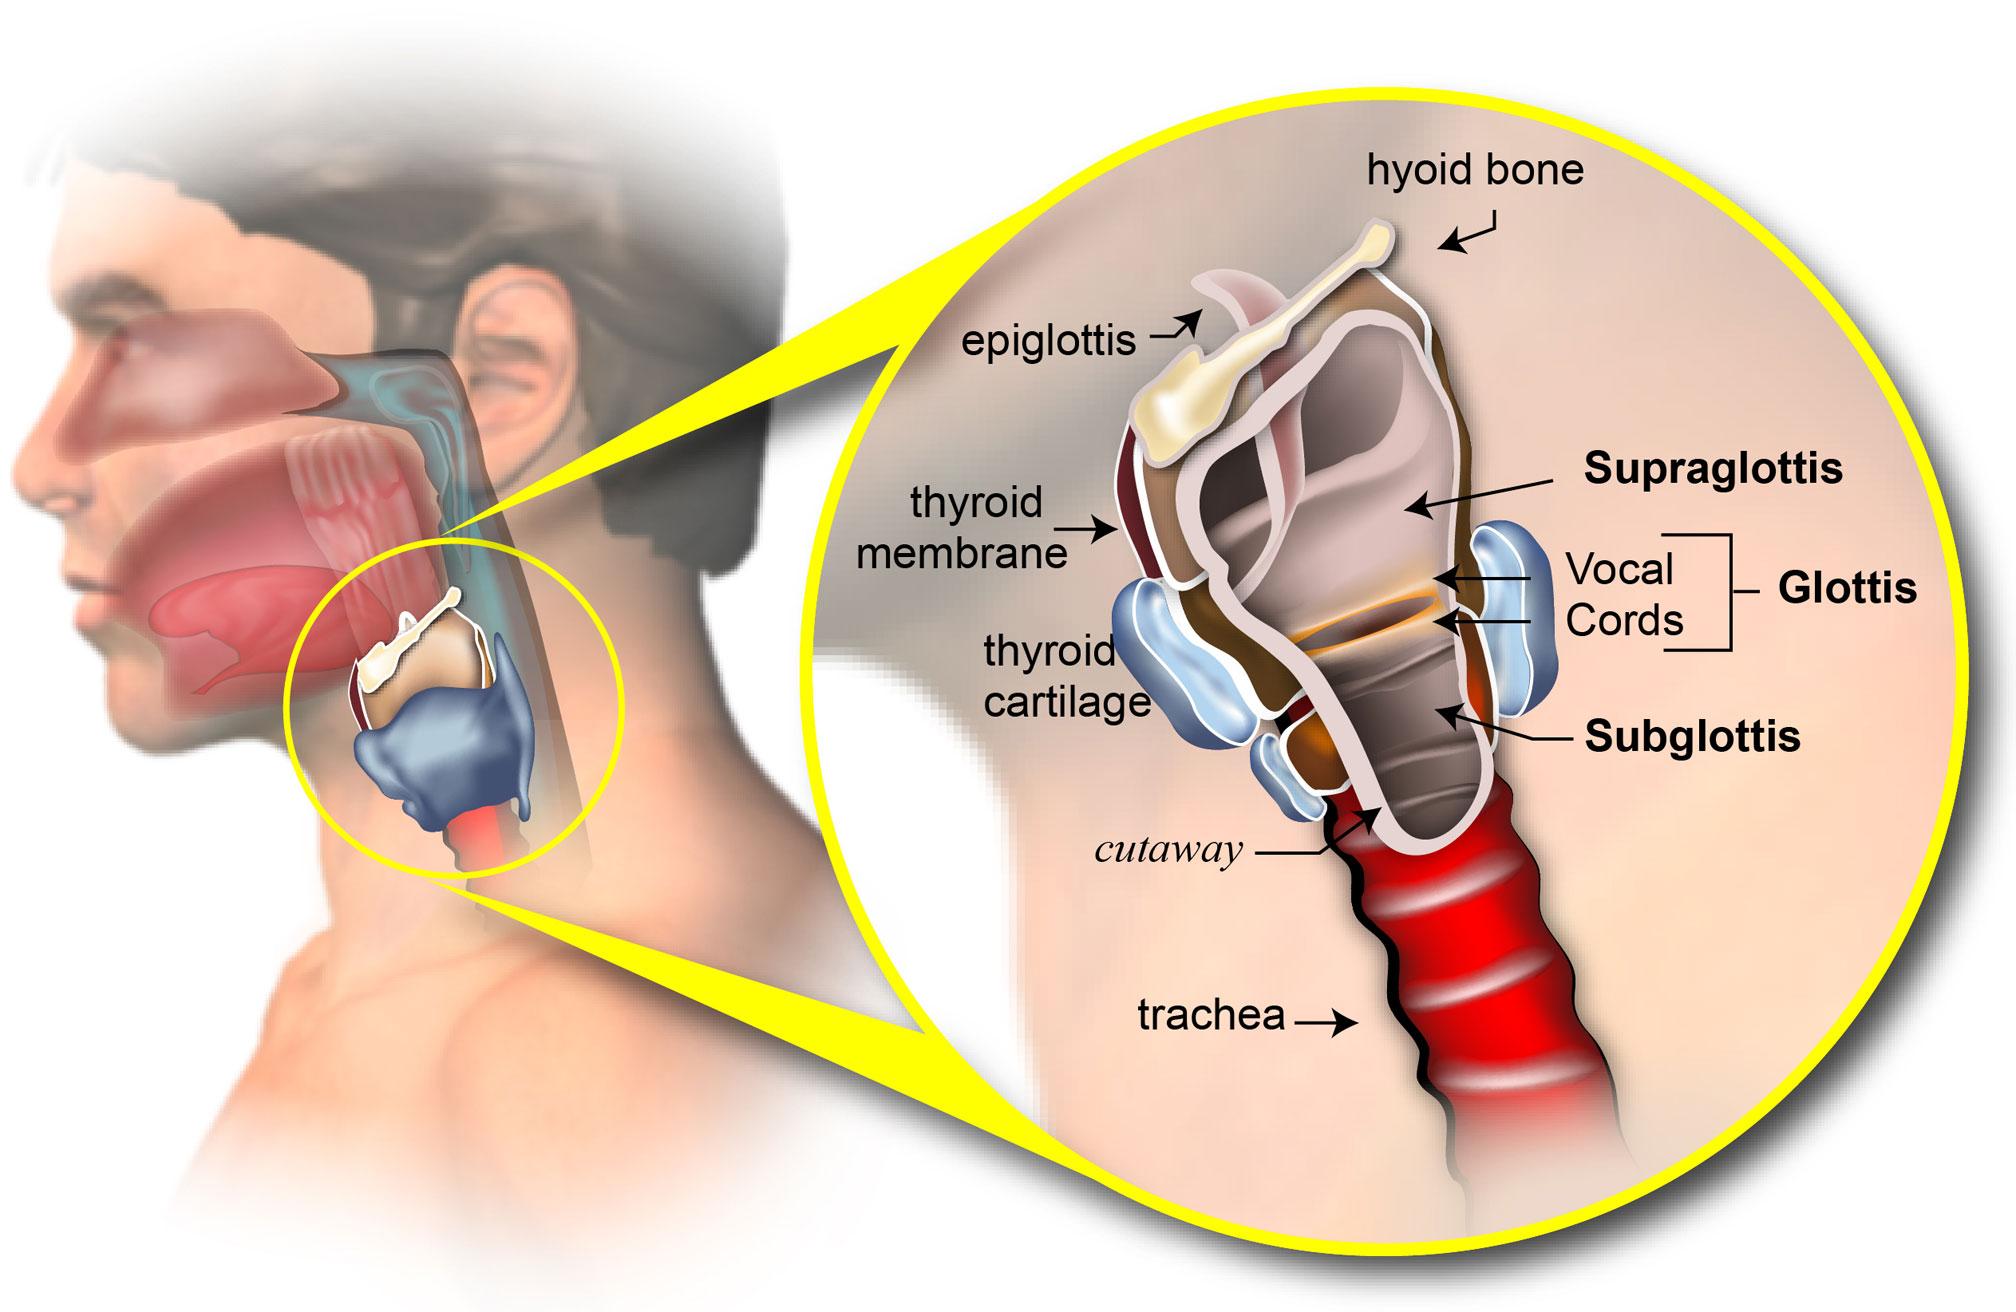 hpv cancer larynx